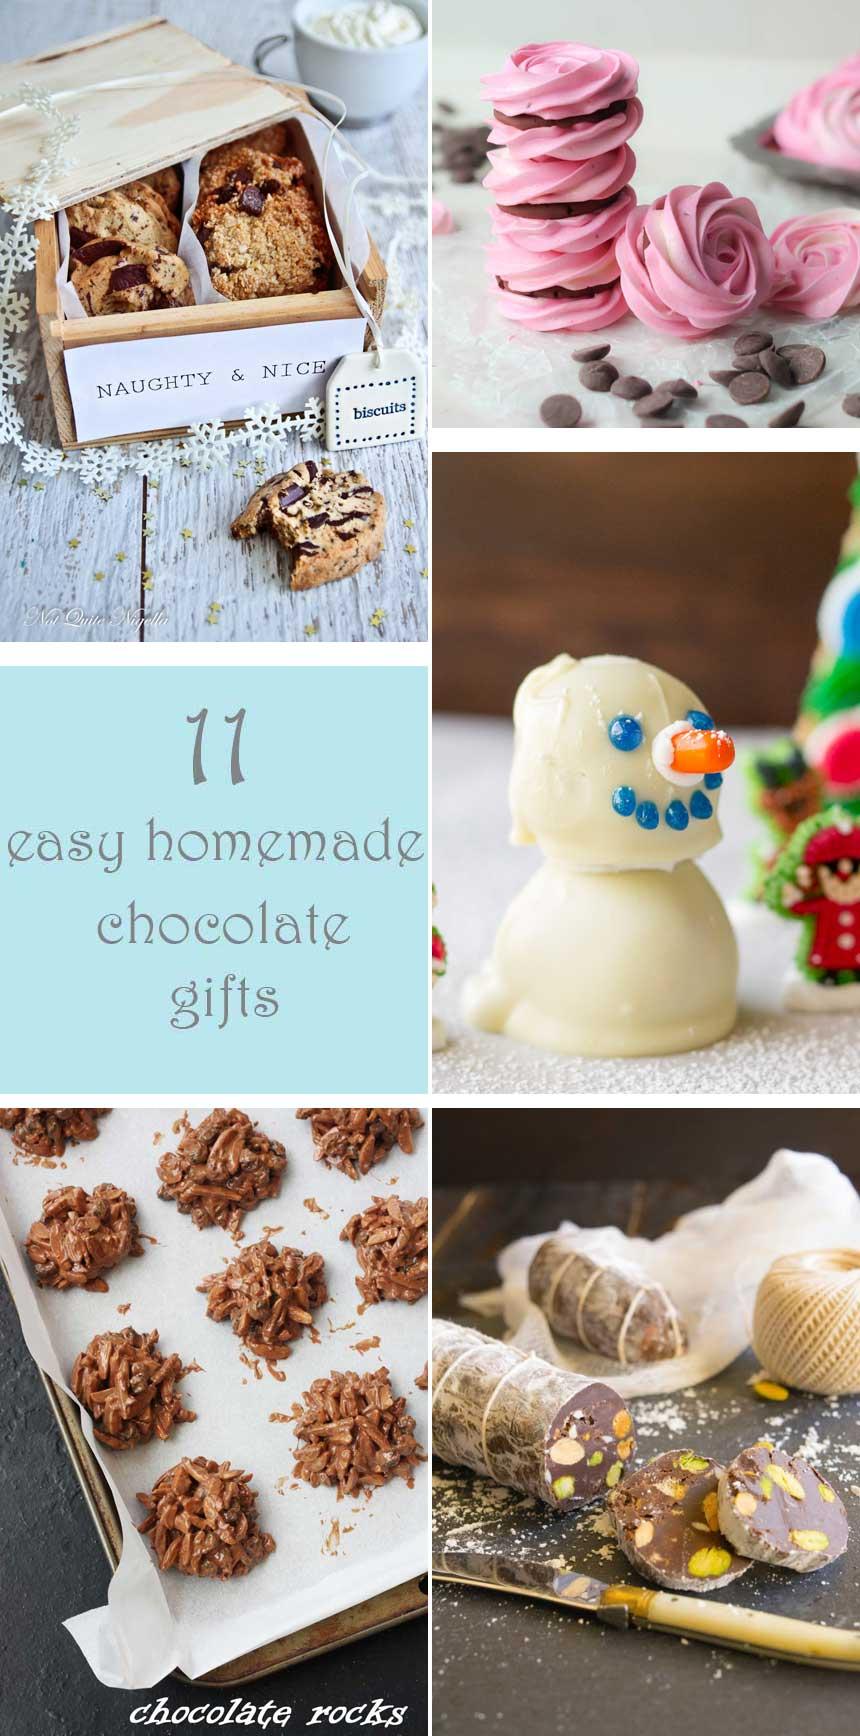 11 easy homemade chocolate gifts